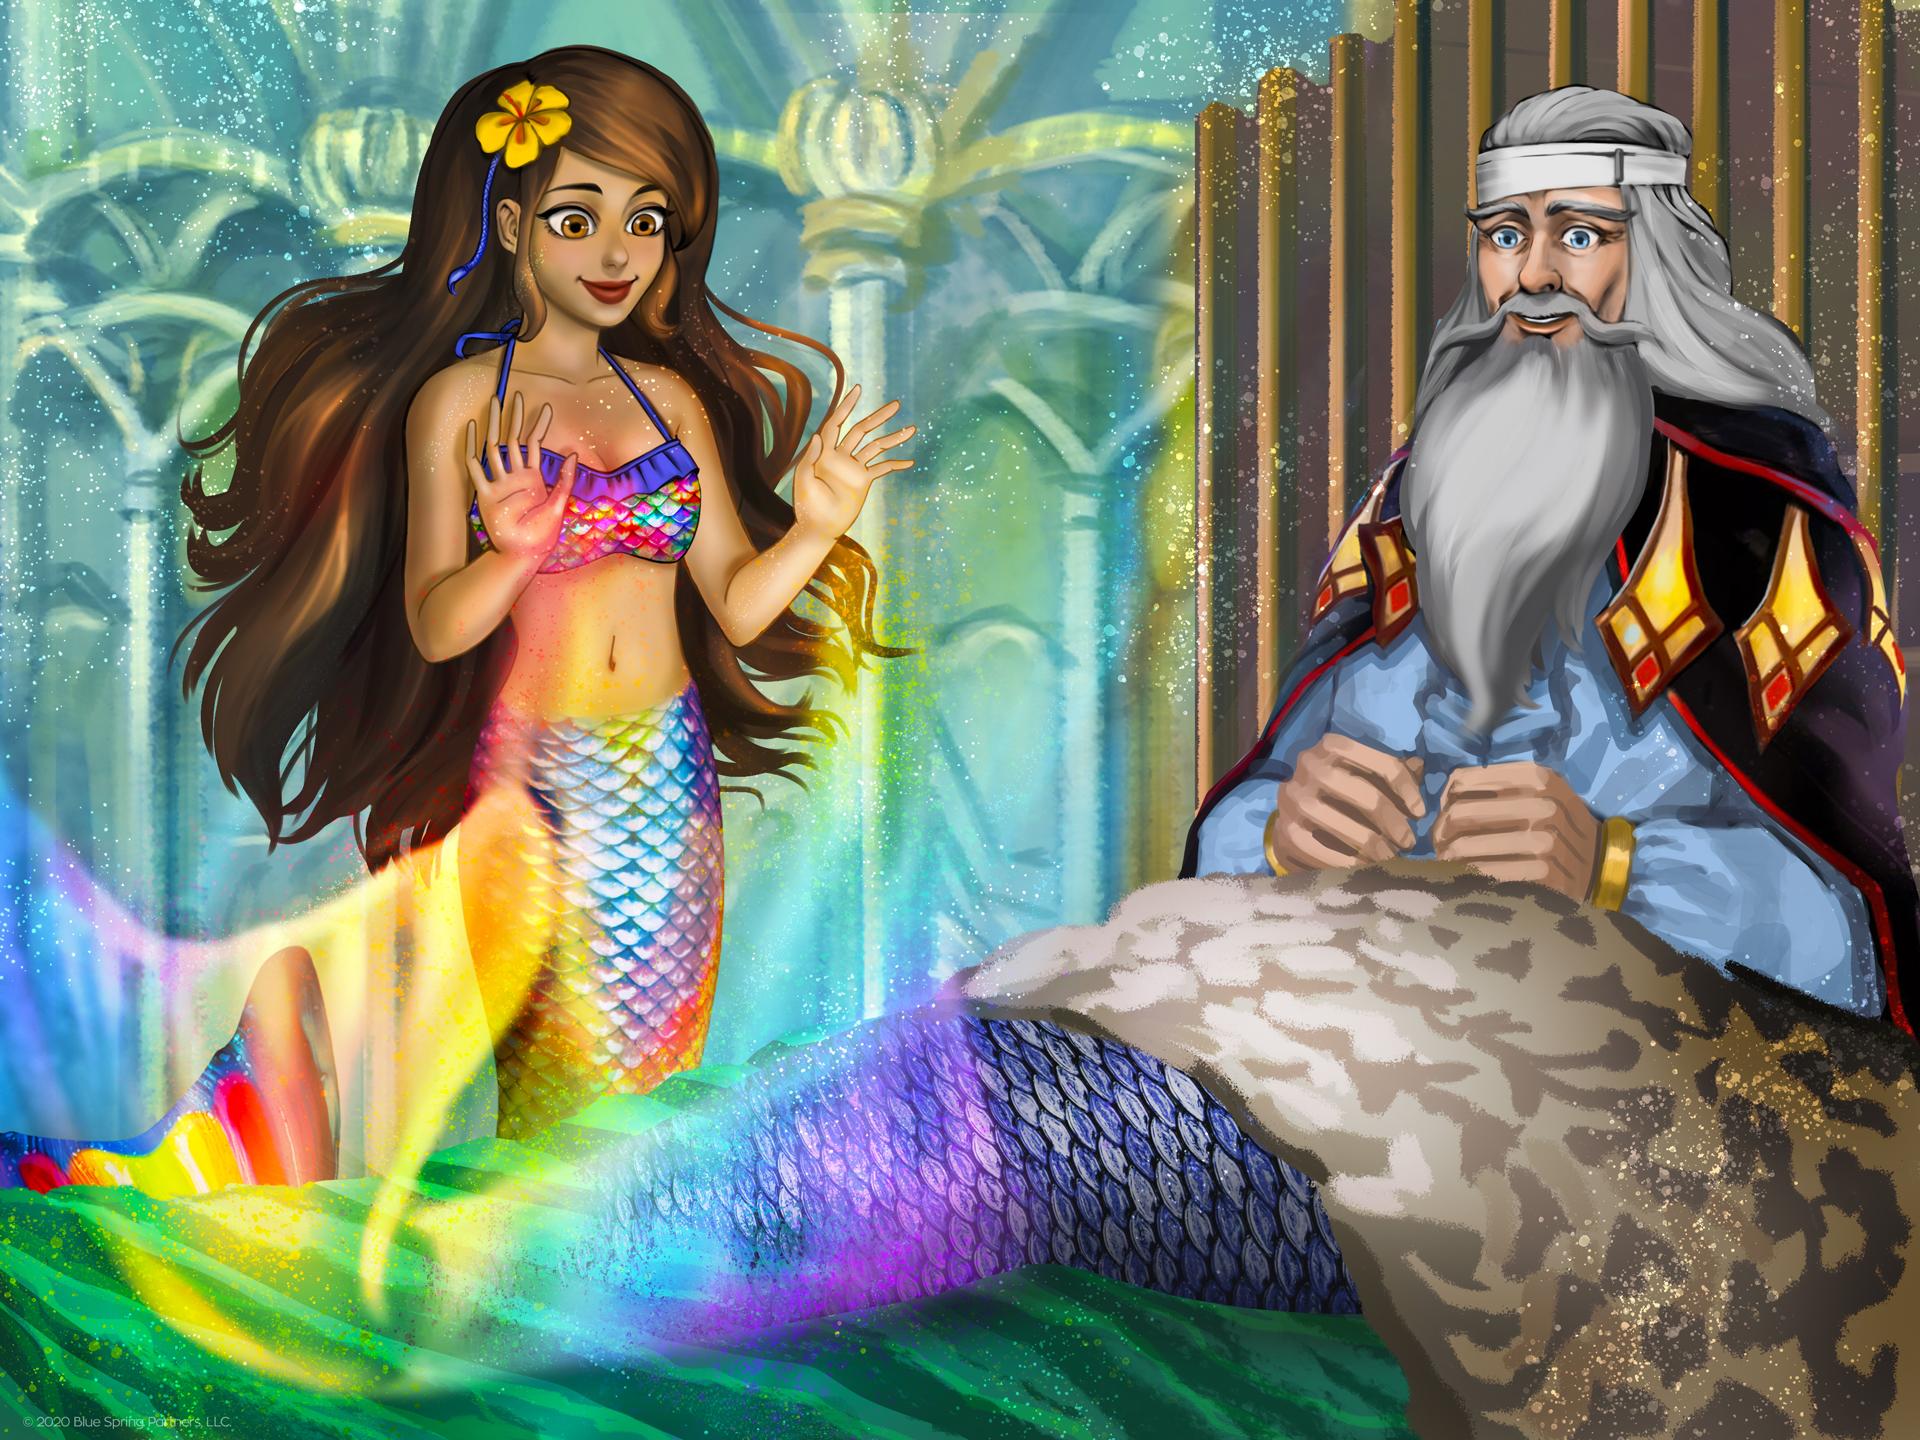 Mermaiden Serena demonstrates her power on Chancellor Darek